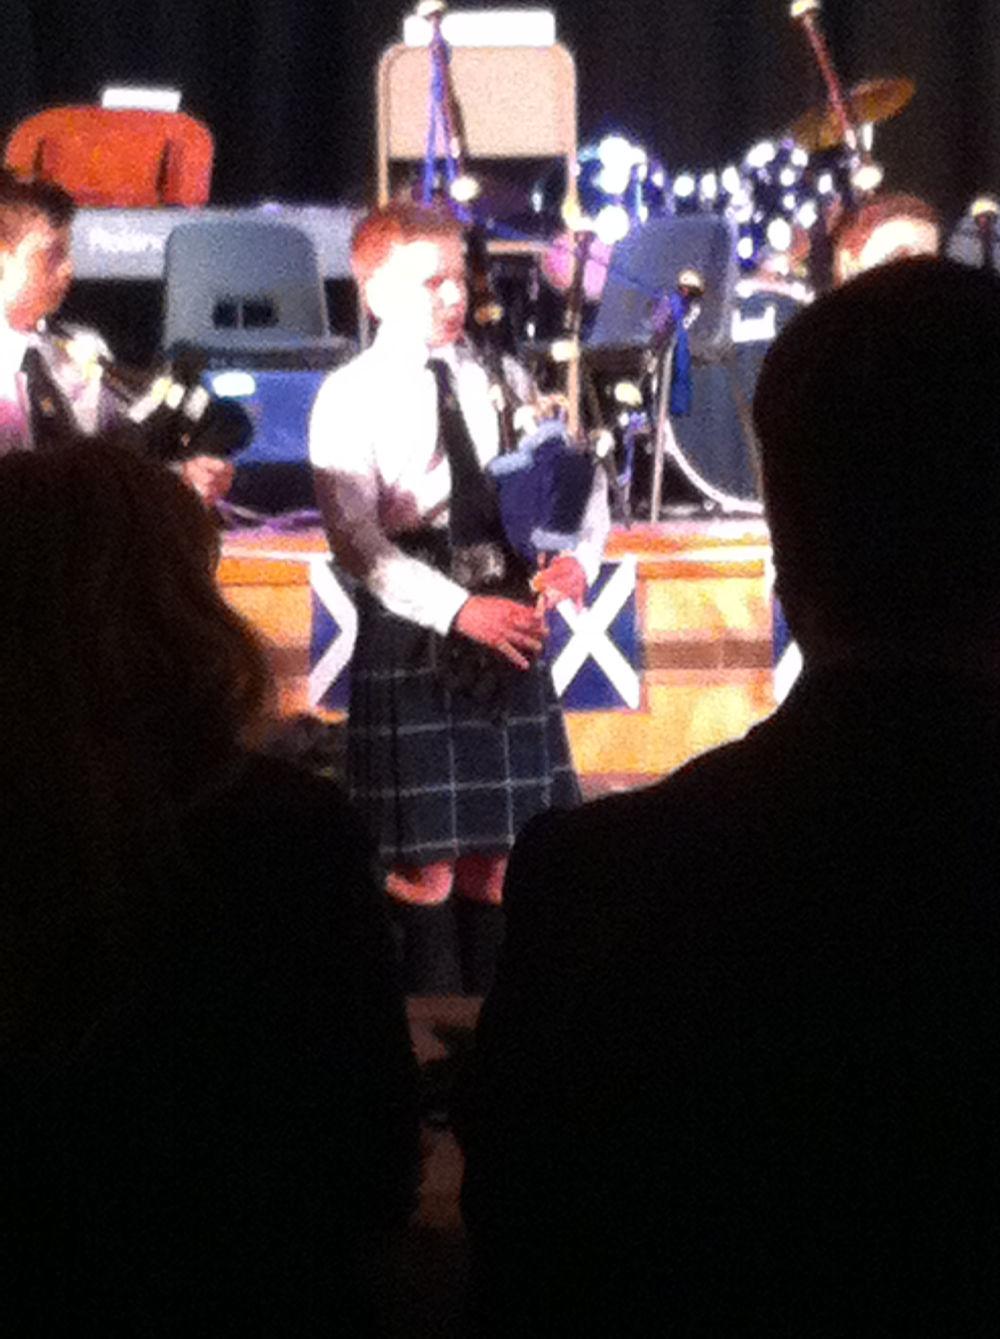 James performing